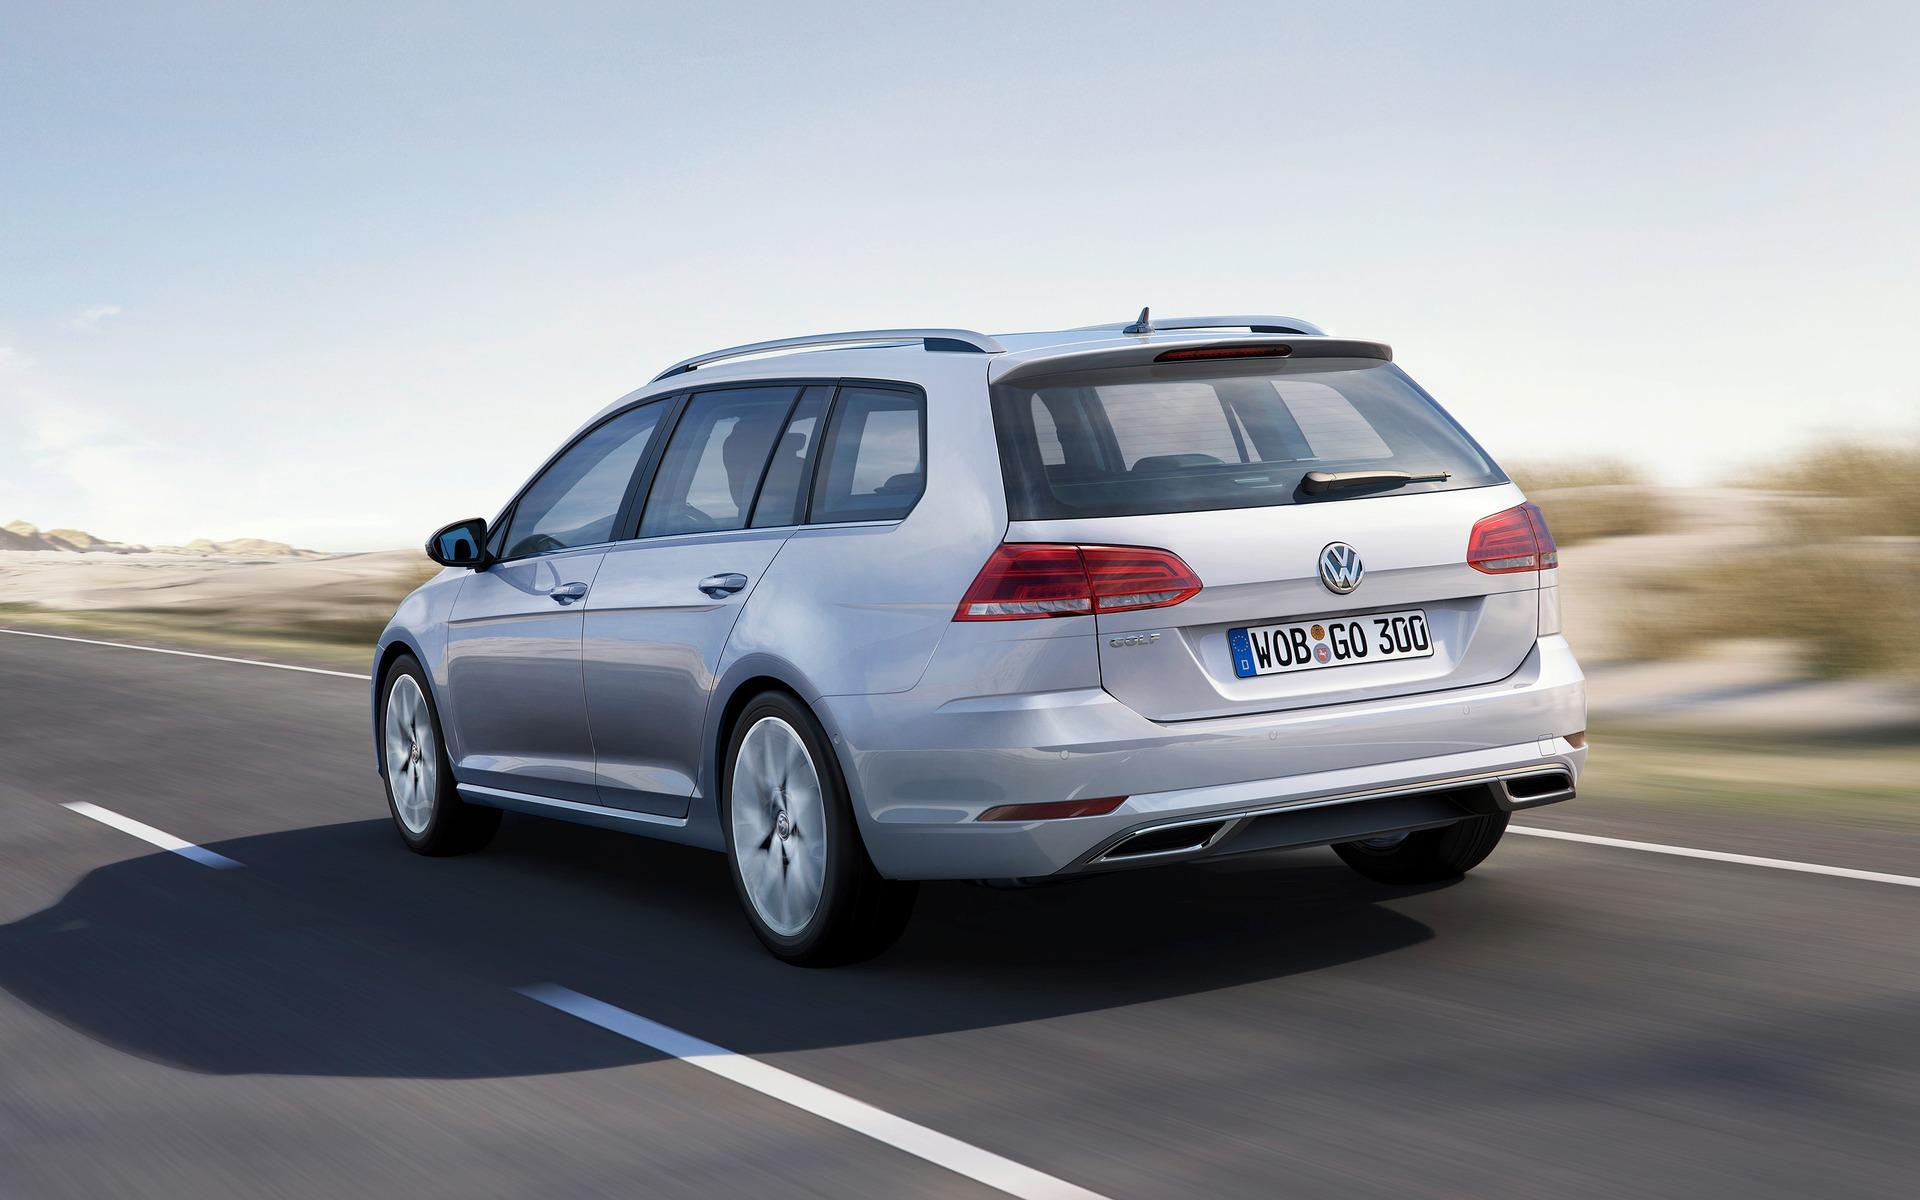 La Volkswagen Golf SportWagen tire sa révérence 377133_2019_Volkswagen_Golf